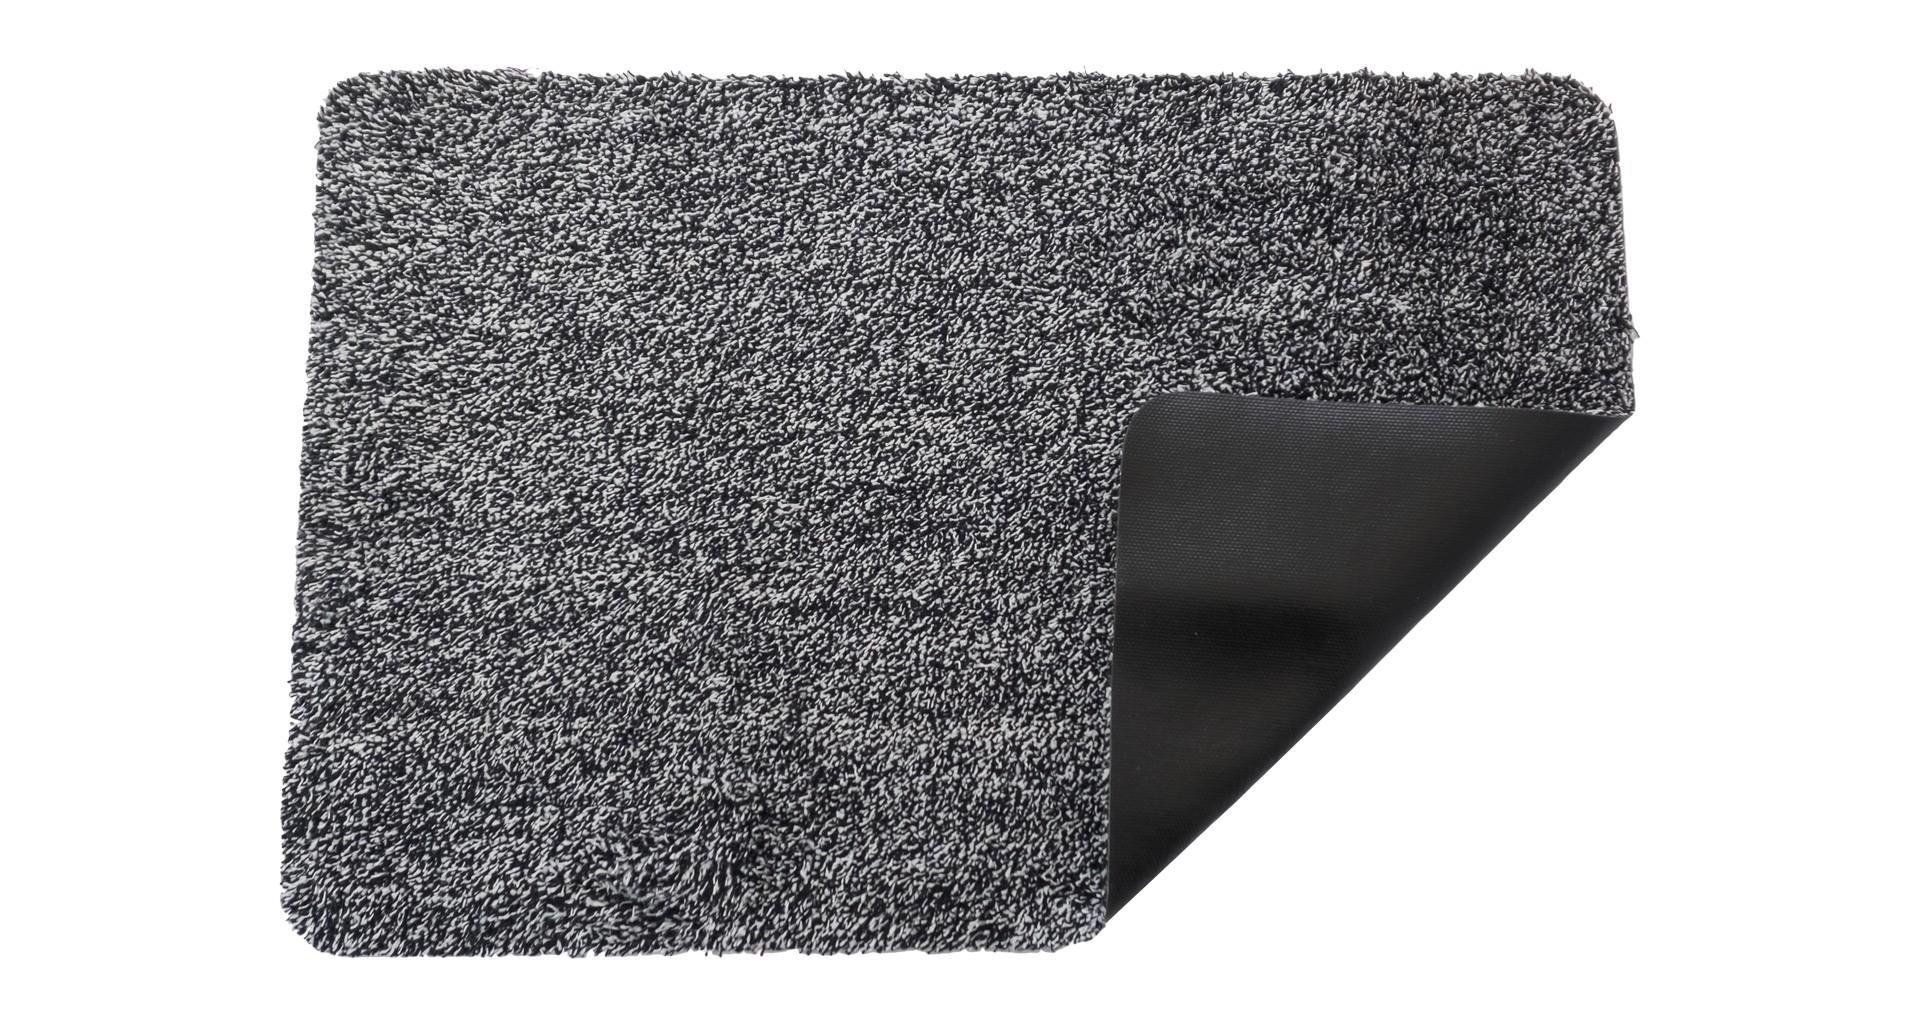 Коврик суперпоглощающий PRC - Super Clean Mat 700 x 460 мм 3